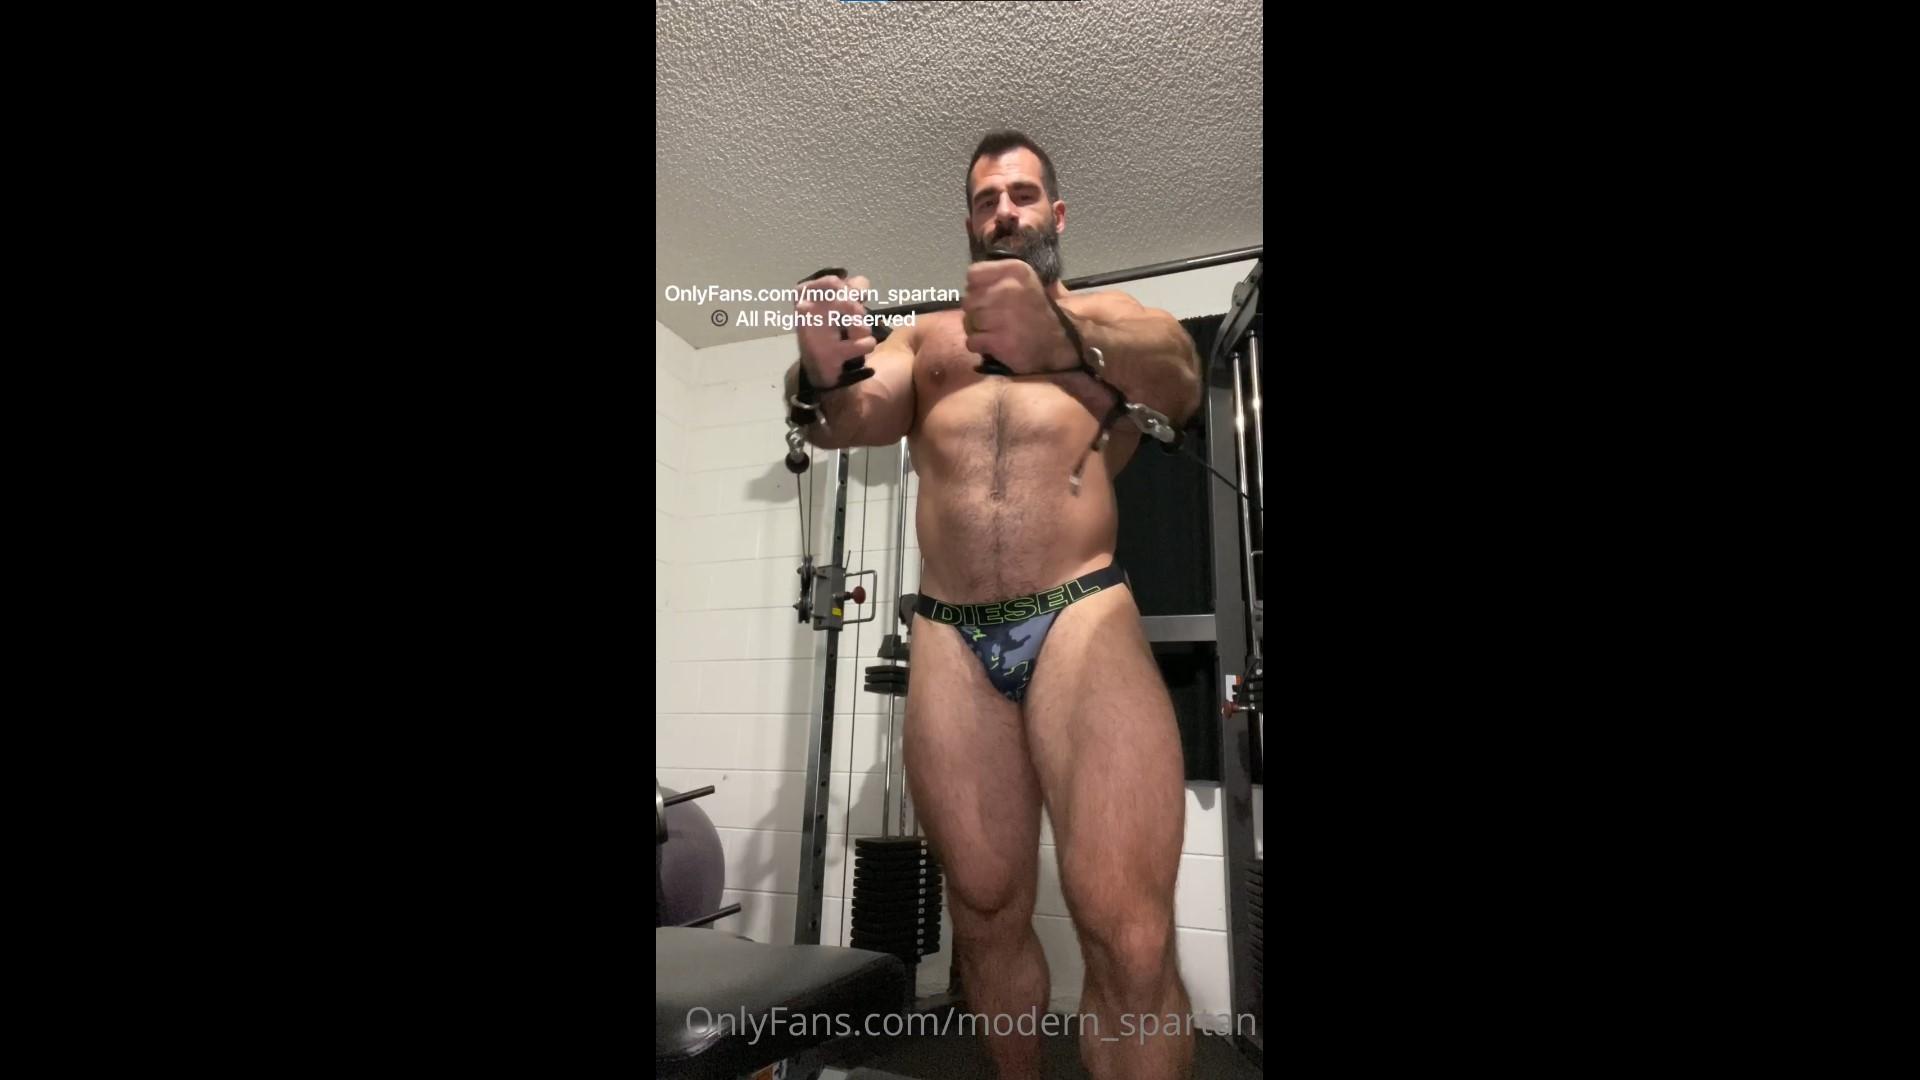 Working out in my jockstrap - Nick Pulos (modern_spartan)